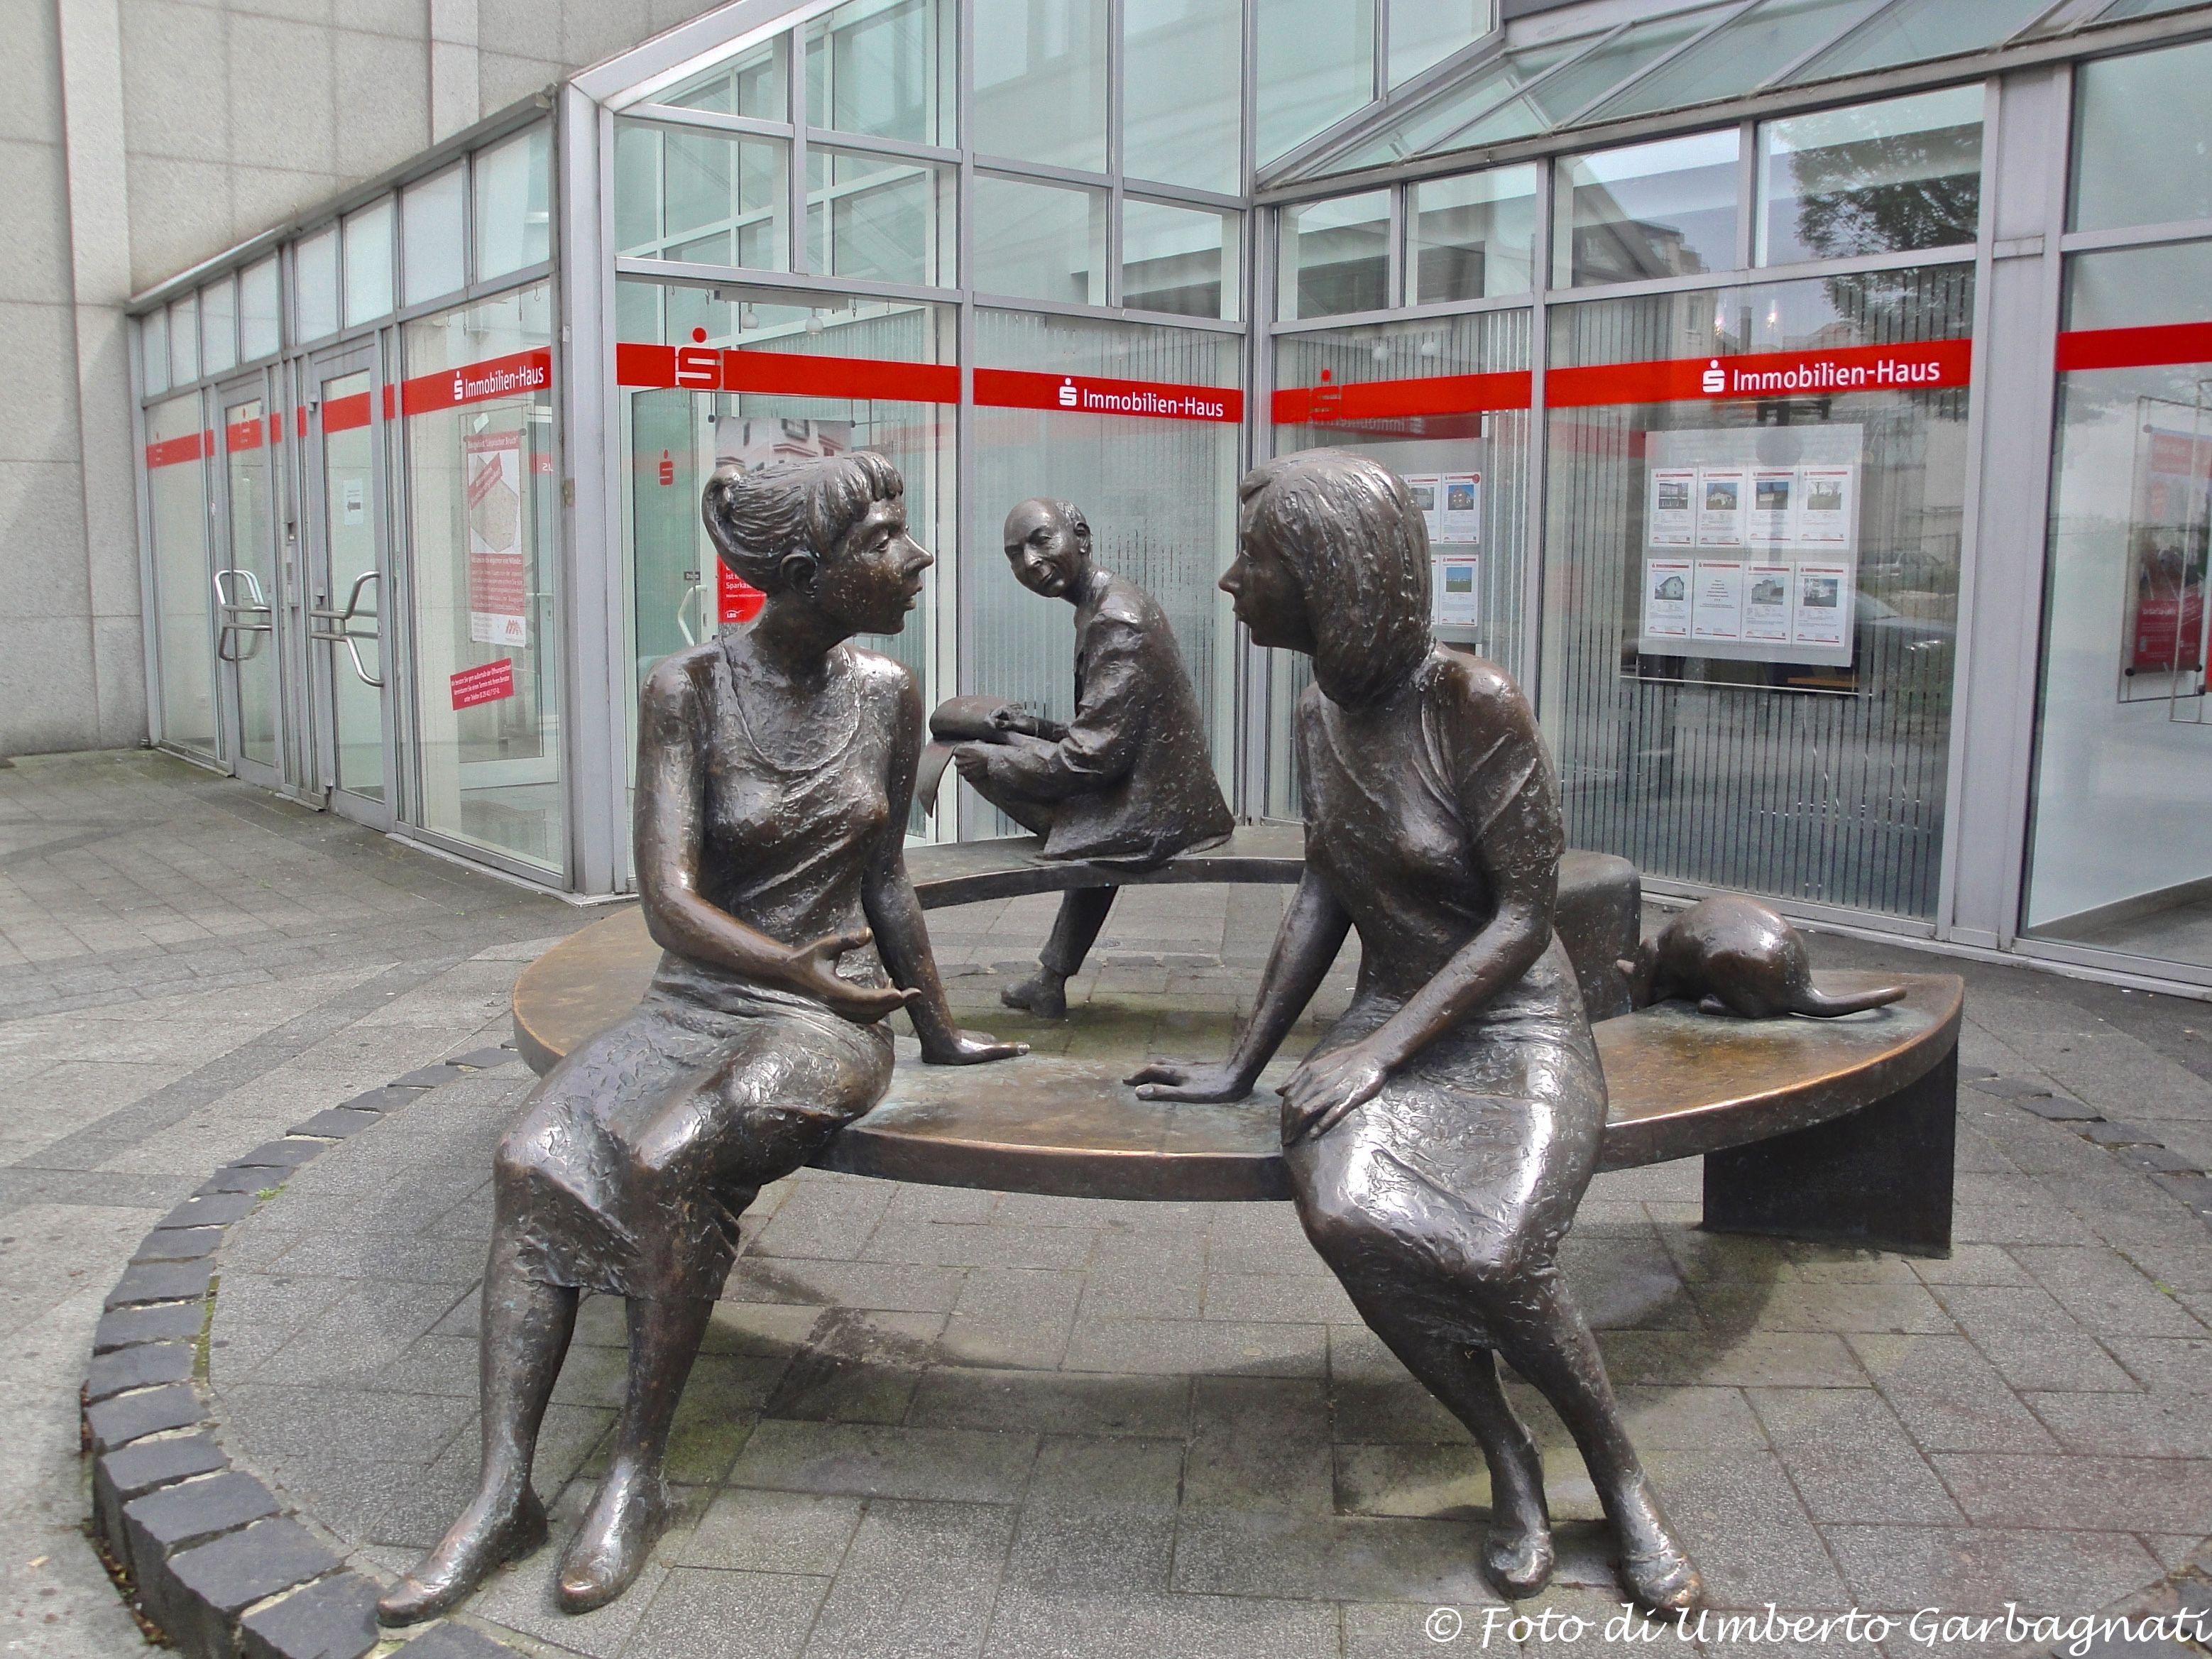 Panchina Rotonda : Panchina rotonda in bronzo con personaggi lippstadt d 28 06